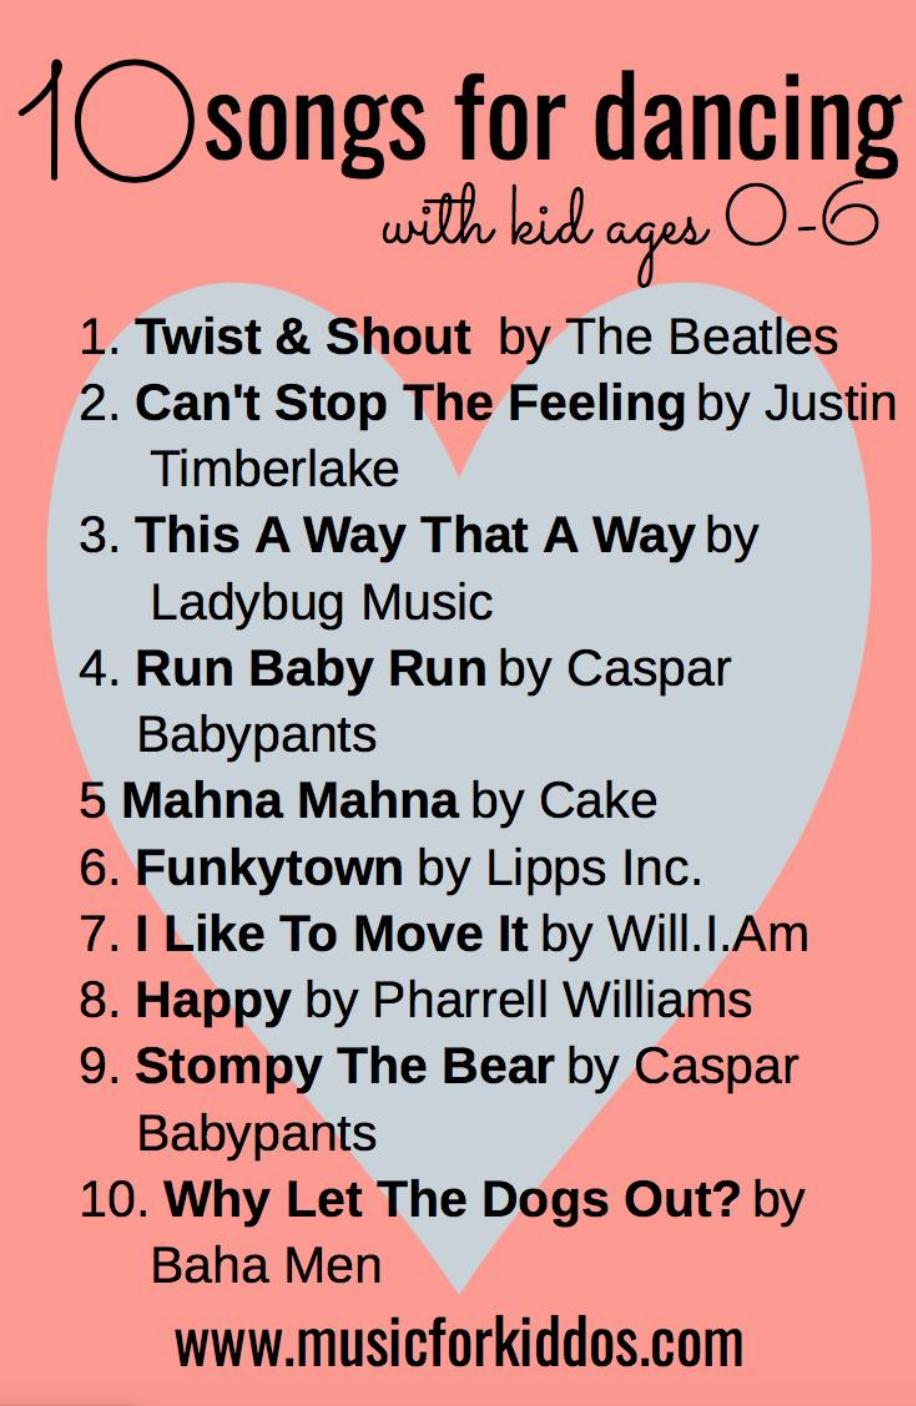 10 Songs for Dancing